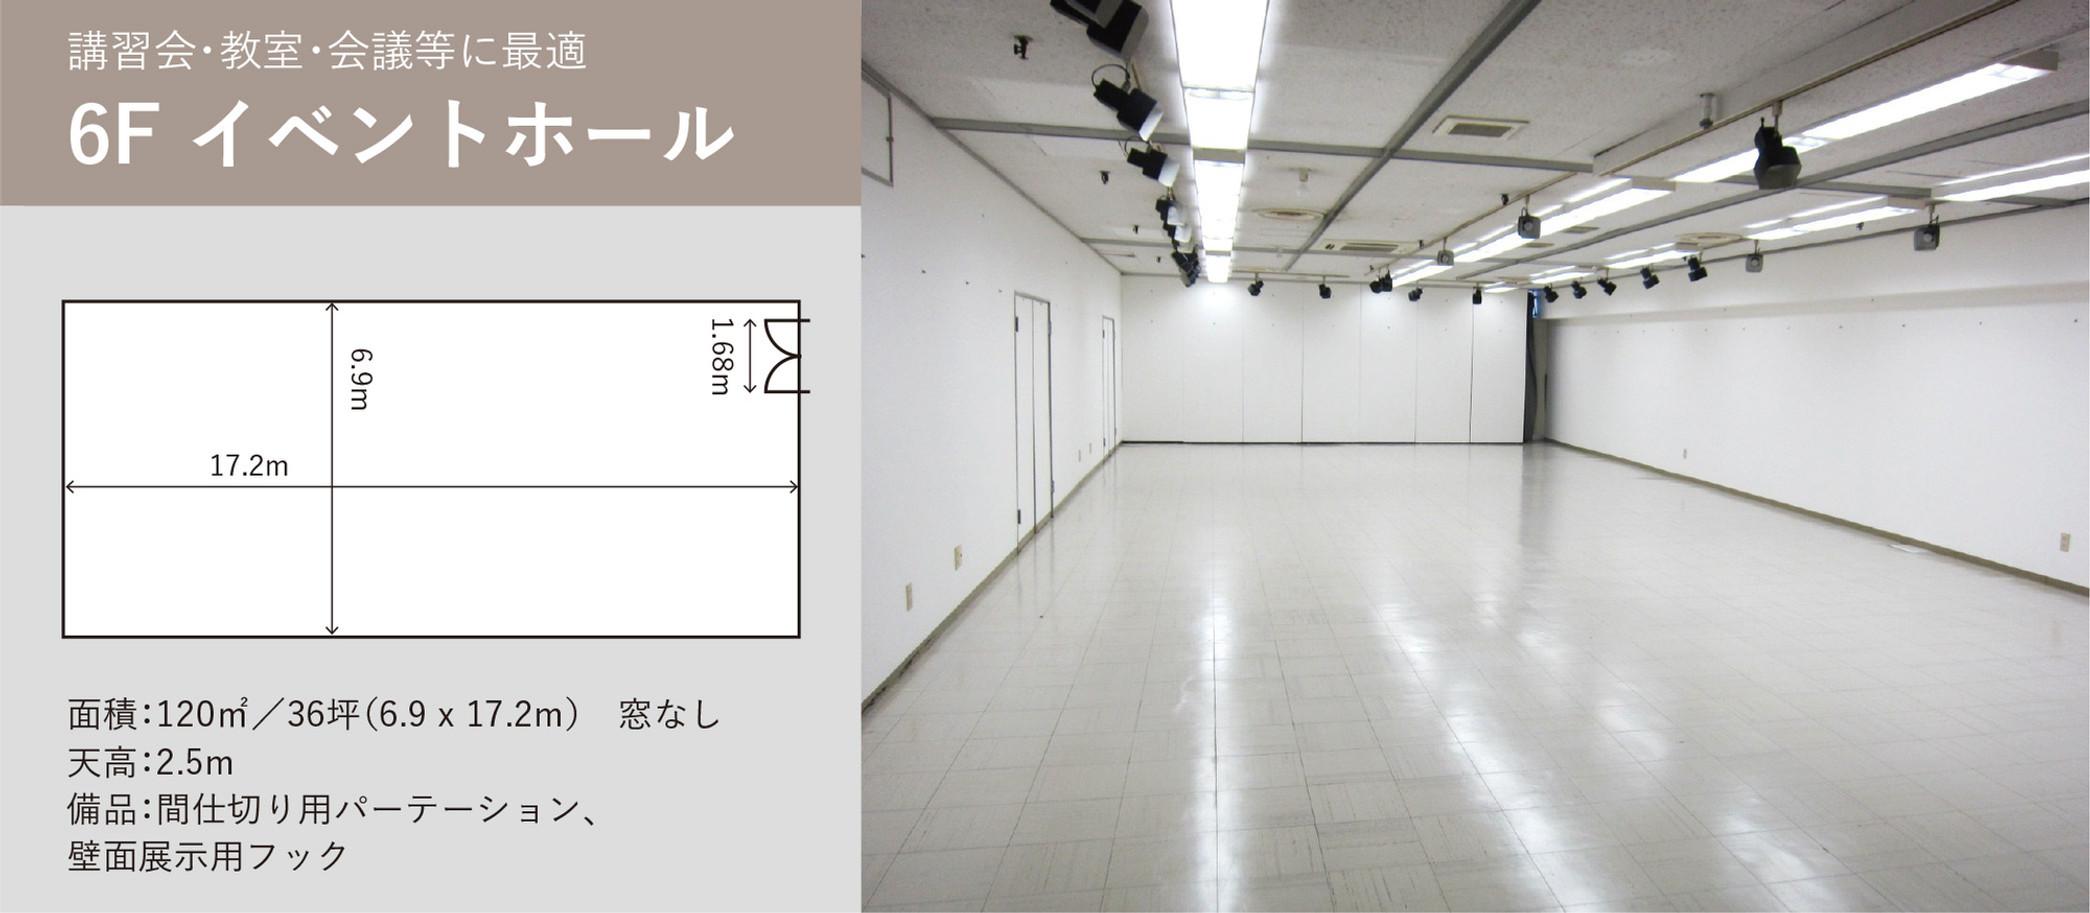 Hall_top_6F_EventHall.jpg